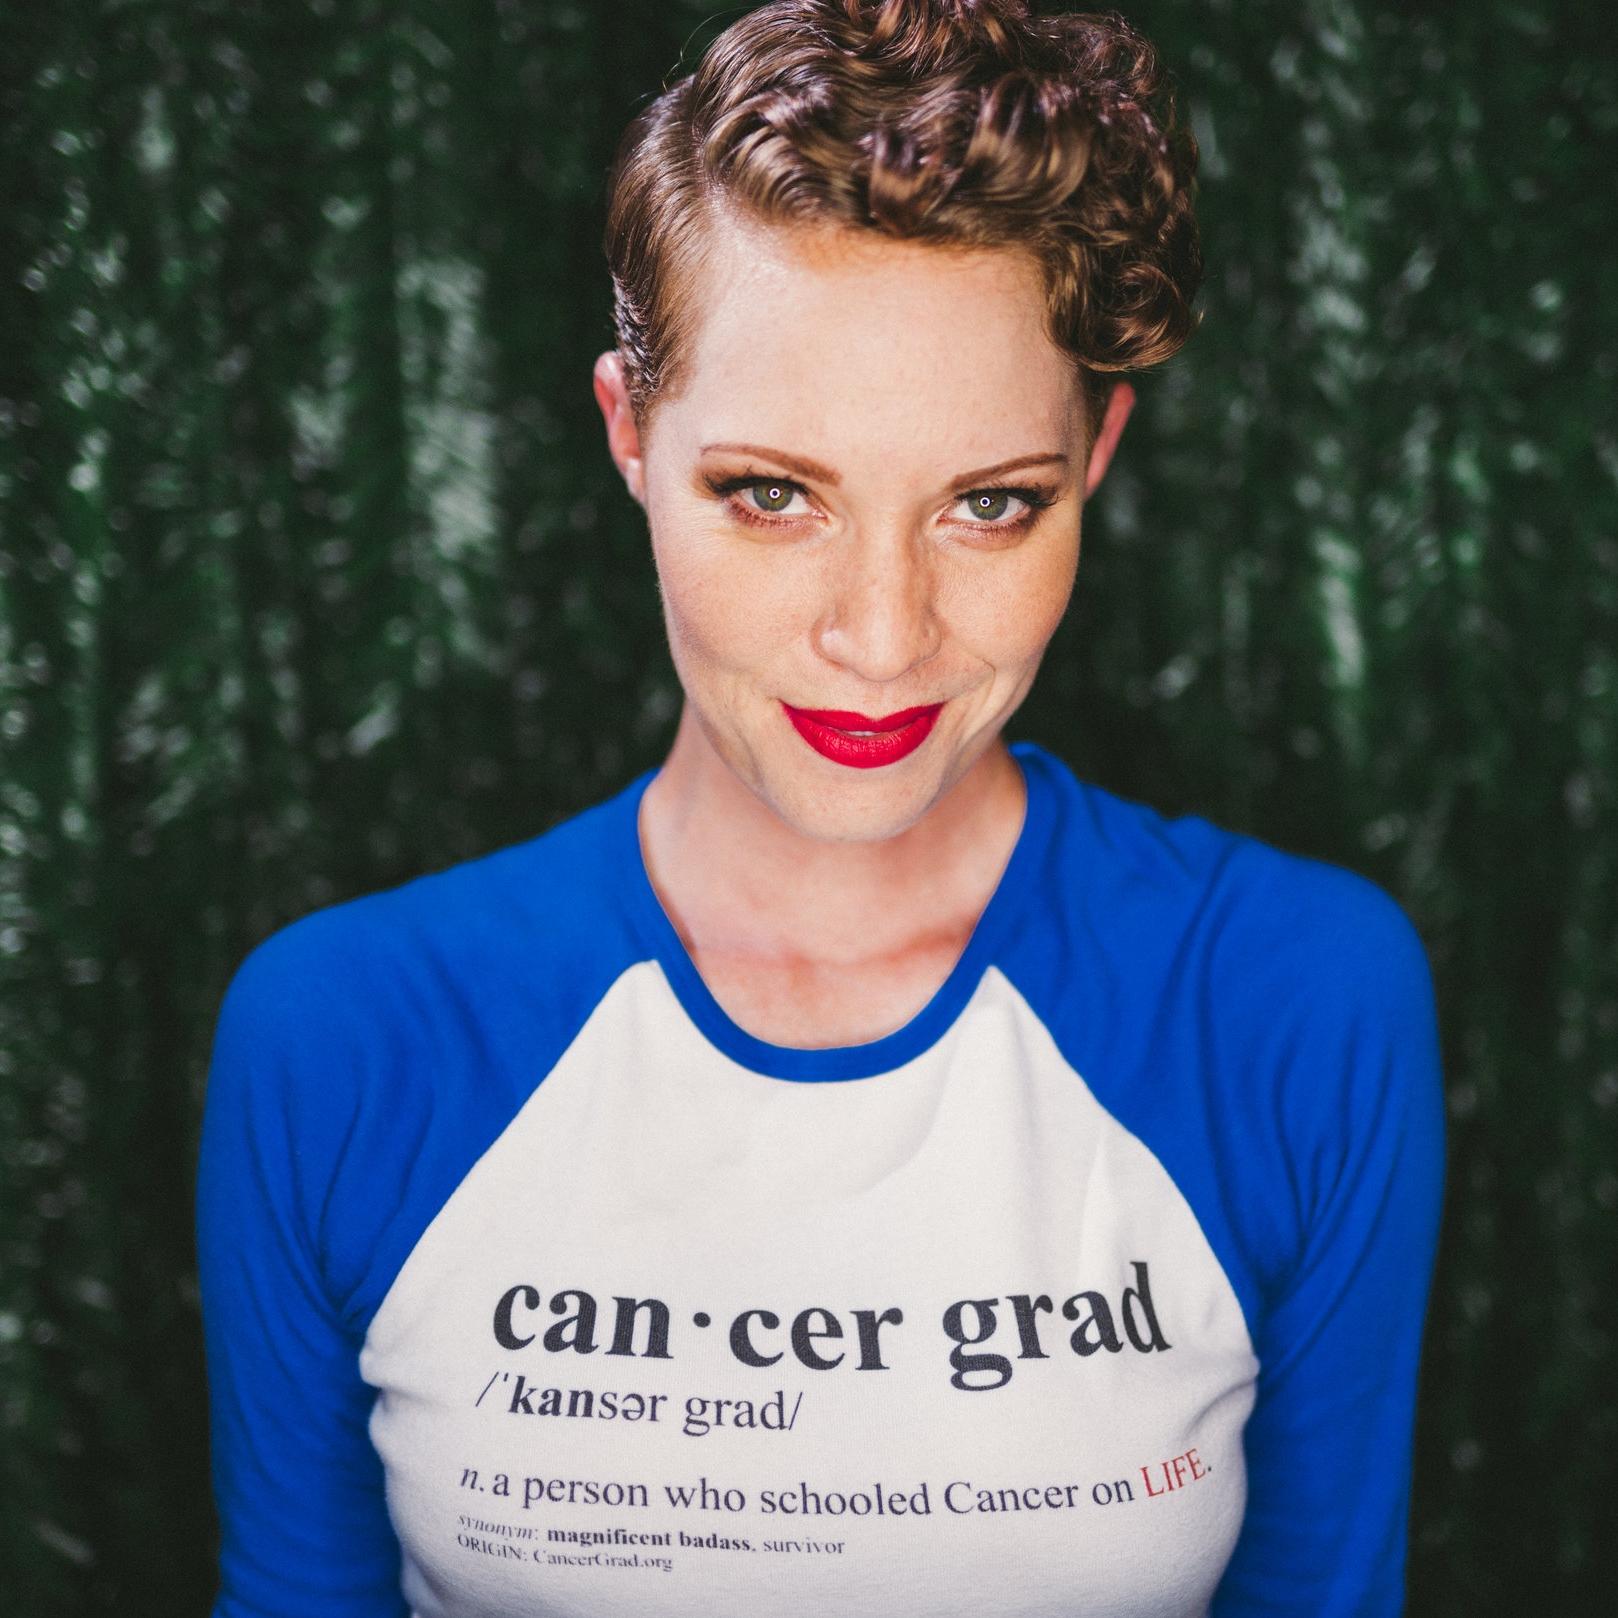 CancerGrad_Baseball_TShirt_Blue_Cancer_Grad_Definition_Aniela_McGuinness